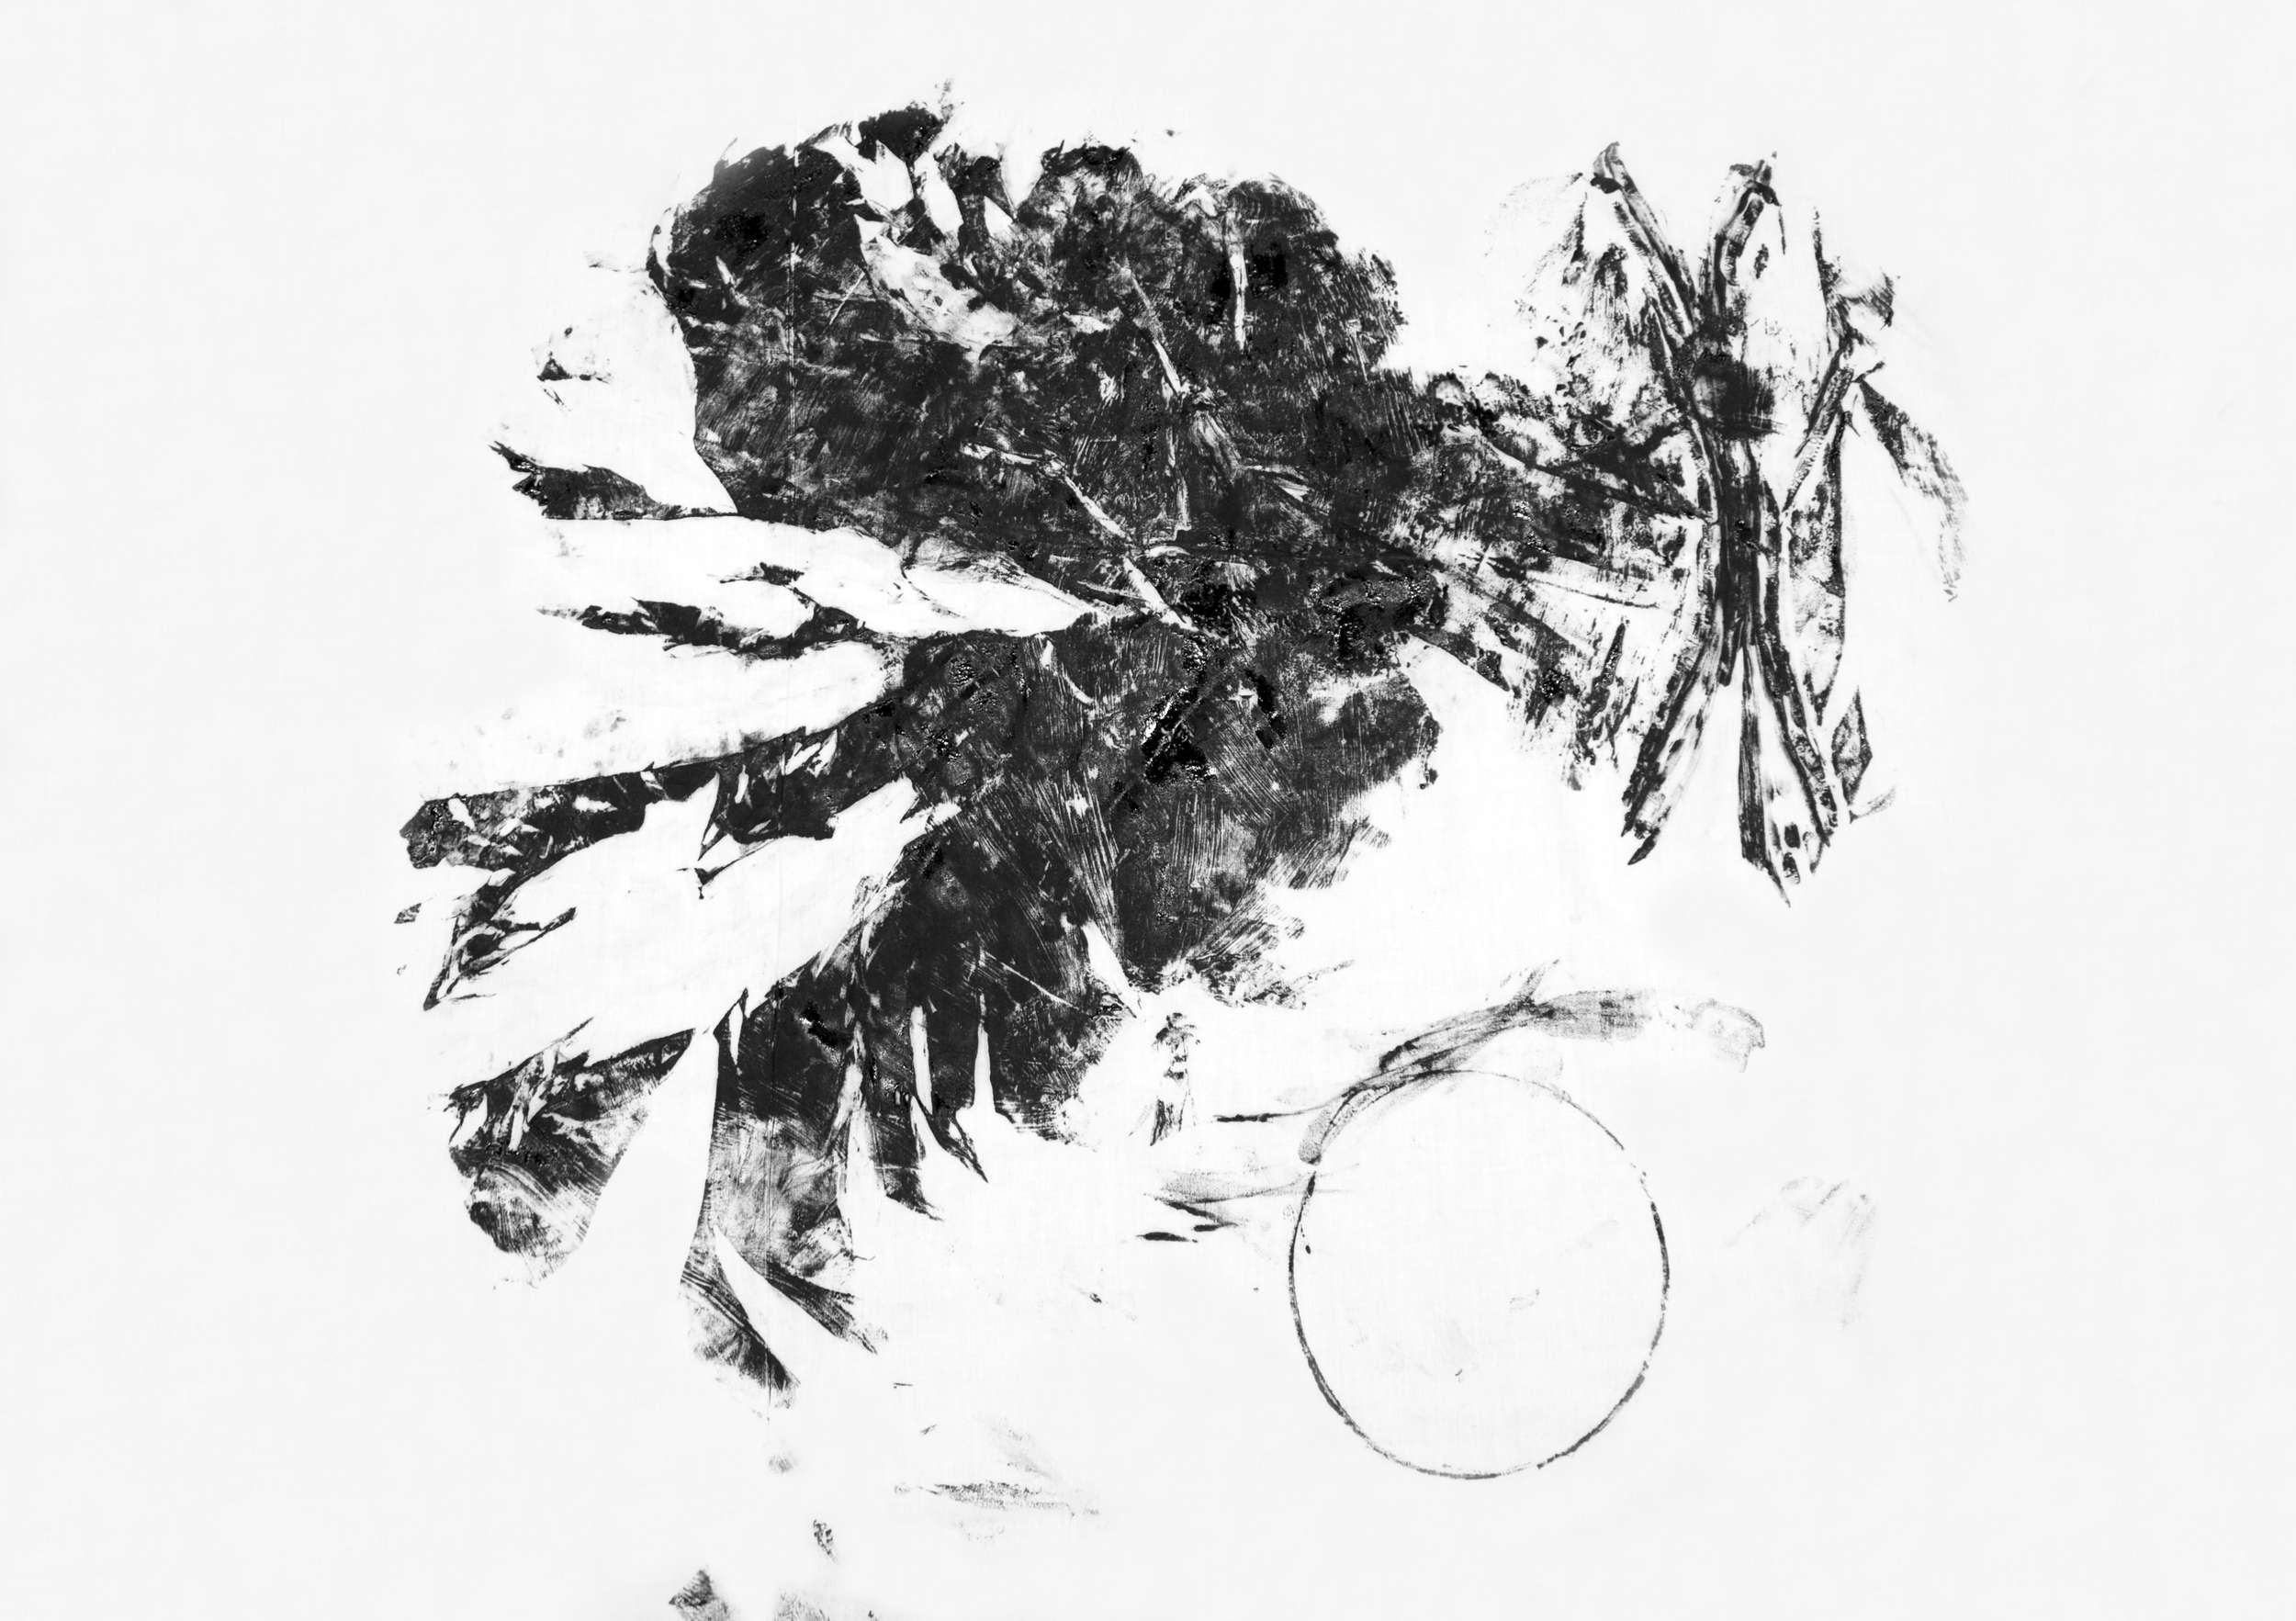 Globe InkB Image